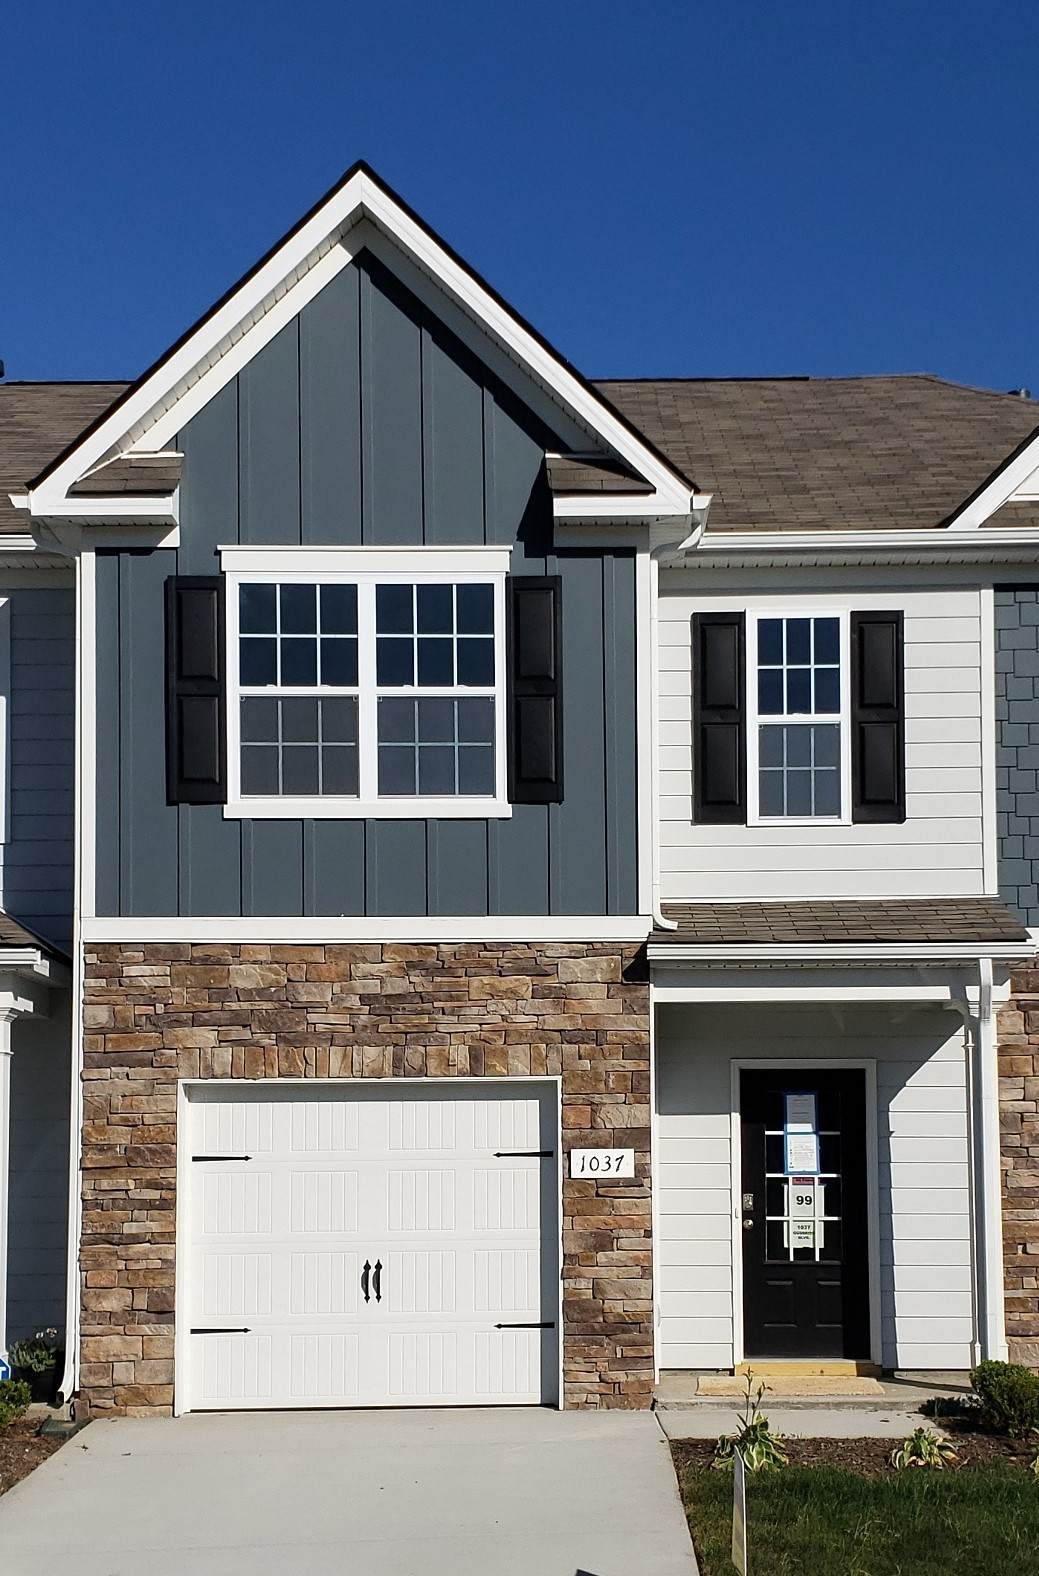 1037 Woodbridge Blvd Lot #99 - Photo 1